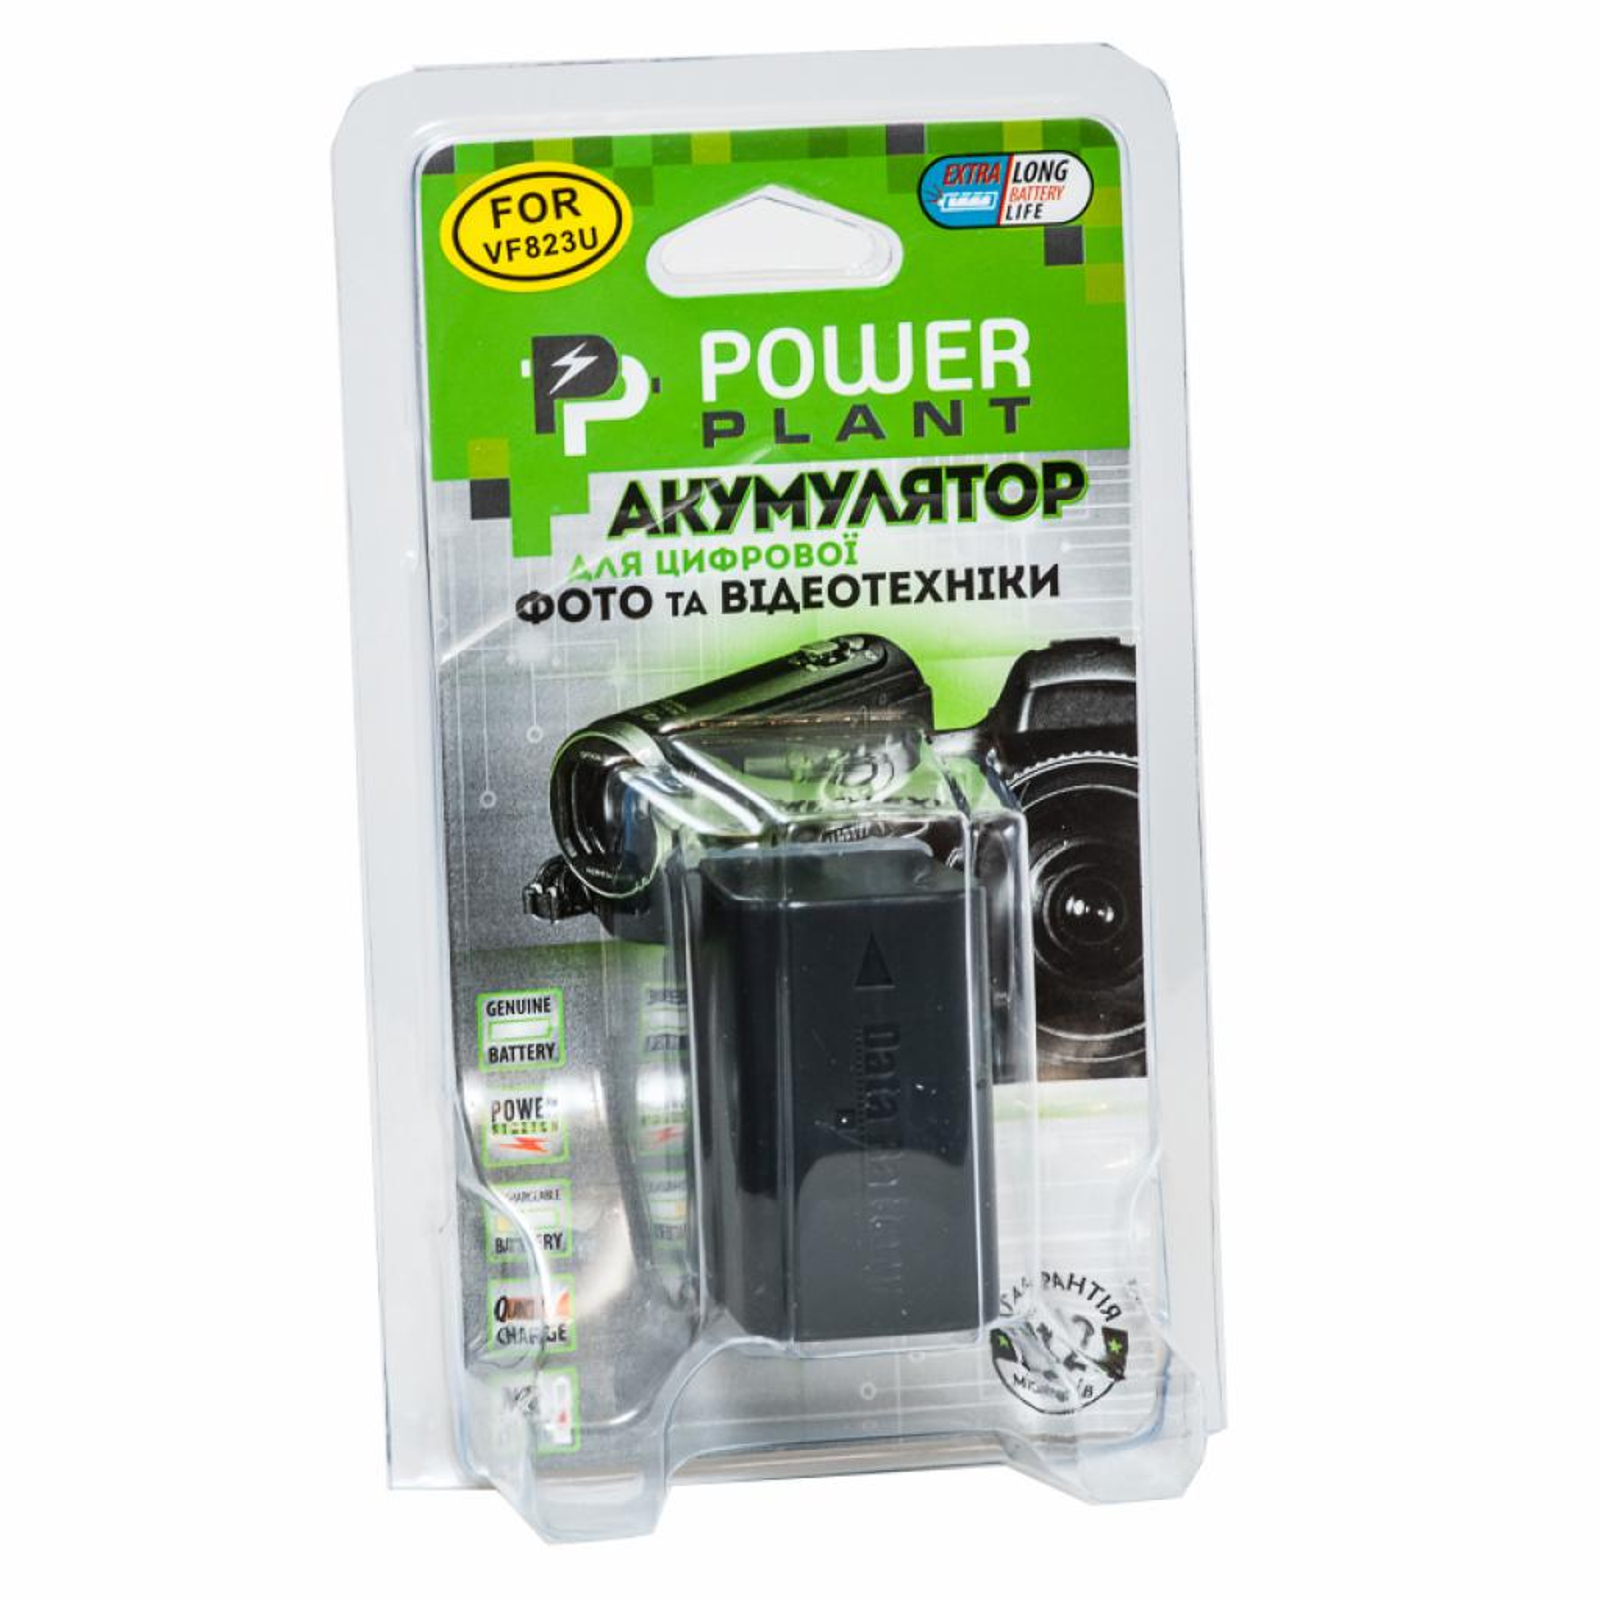 Аккумулятор к фото/видео PowerPlant JVC BN-VF823 (DV00DV1203) изображение 2